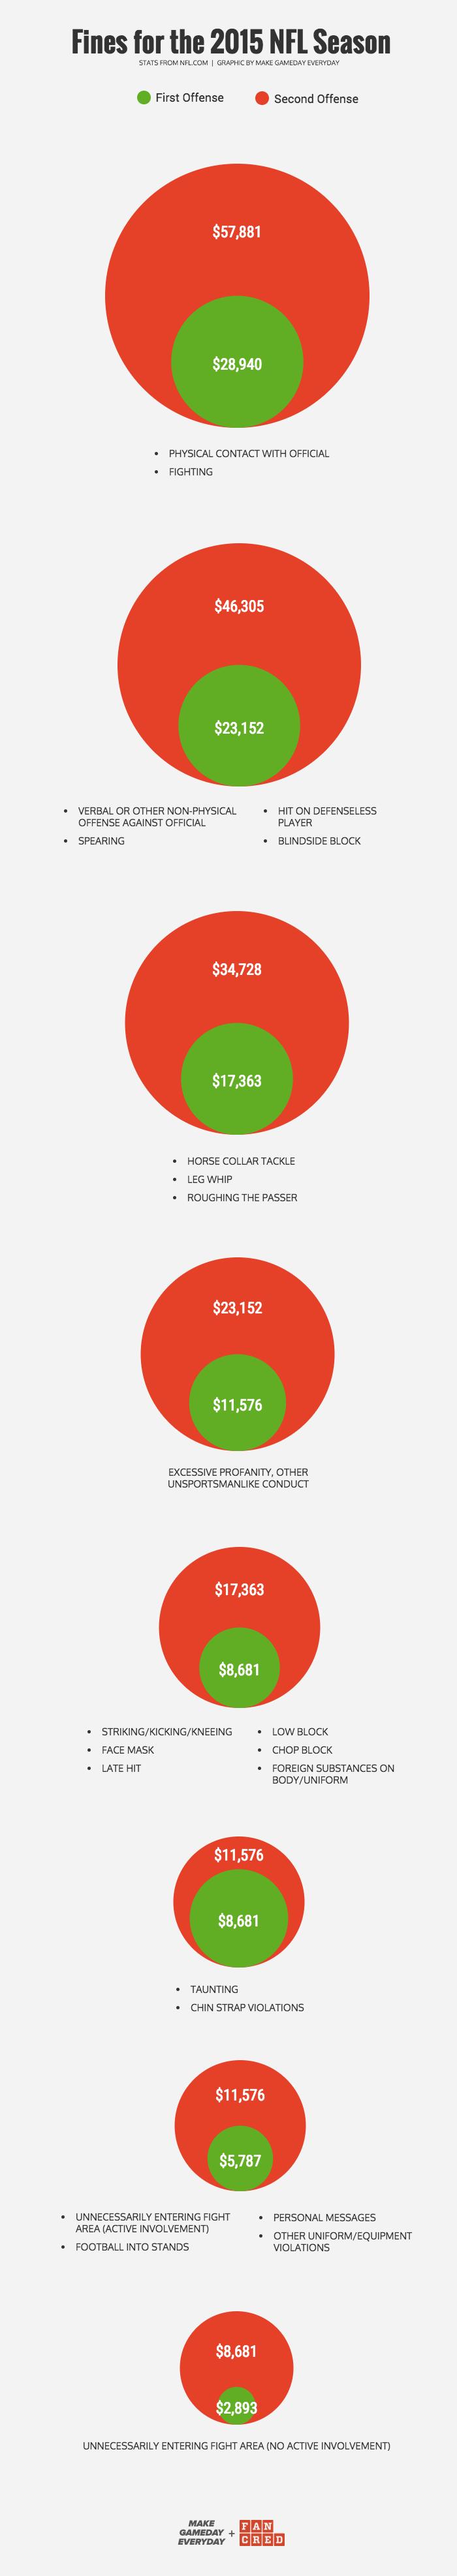 2015 nfl fines.png